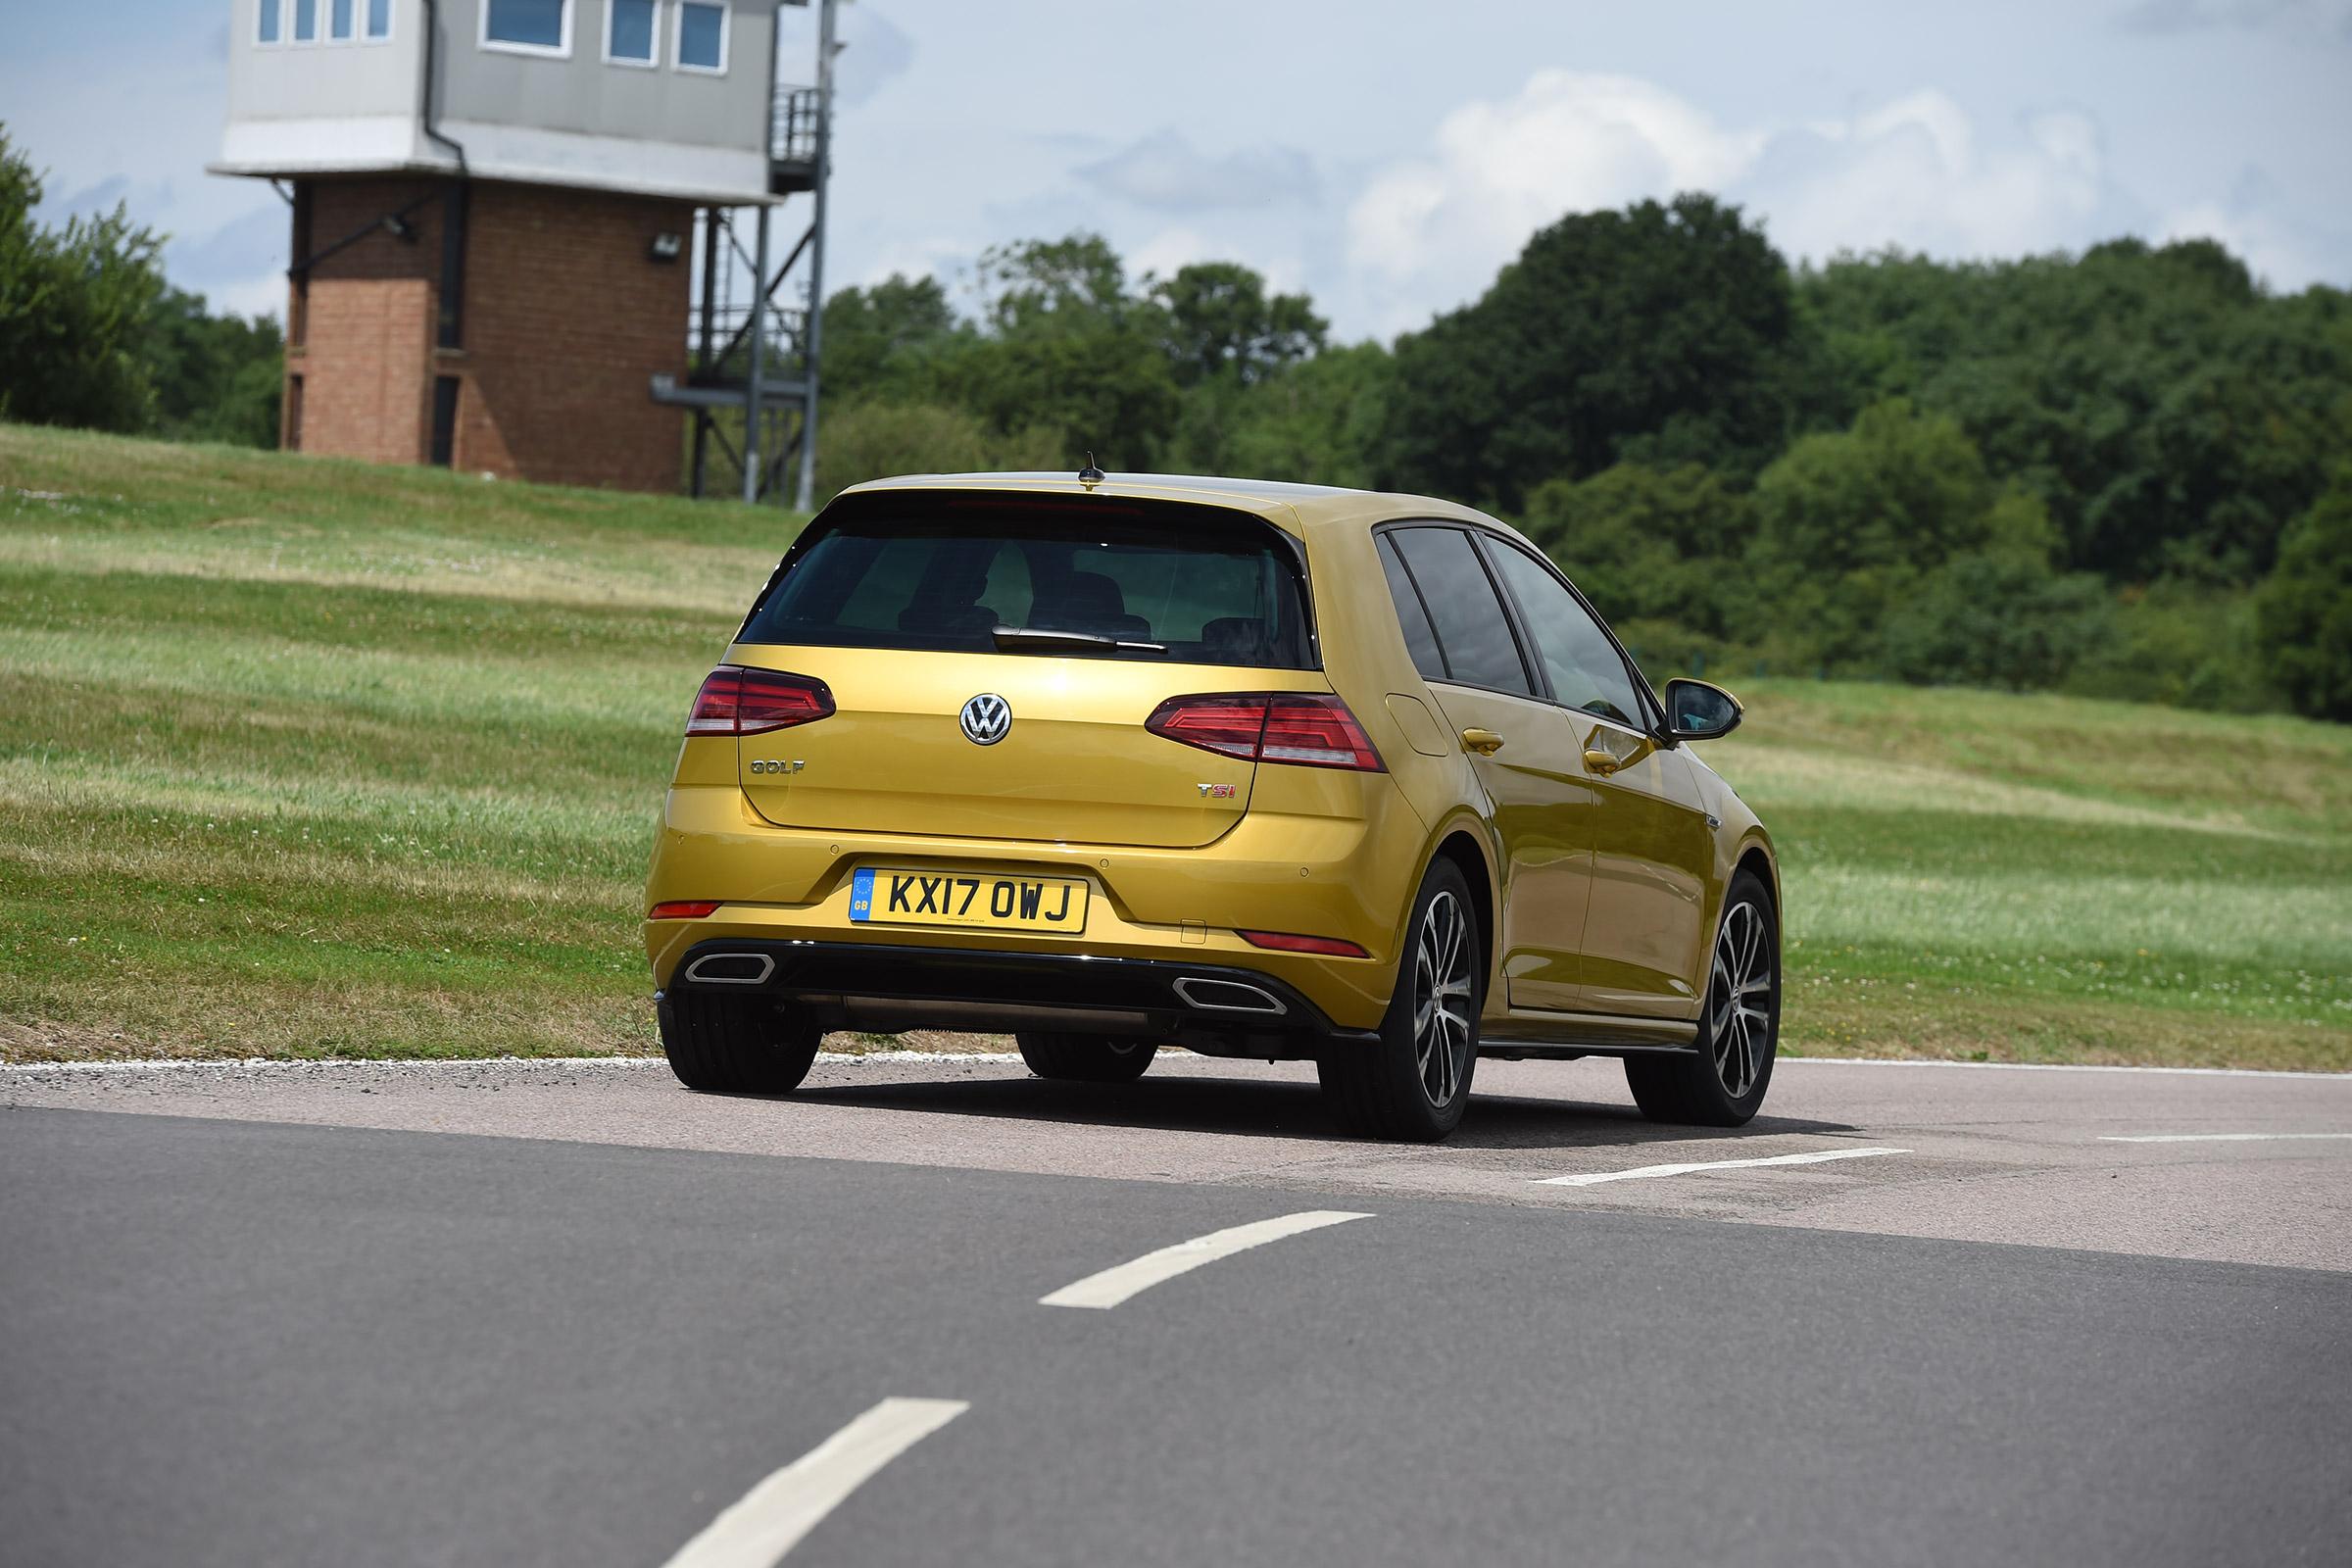 Volkswagen Golf 1 5 TSI Evo review - does the Evo engine